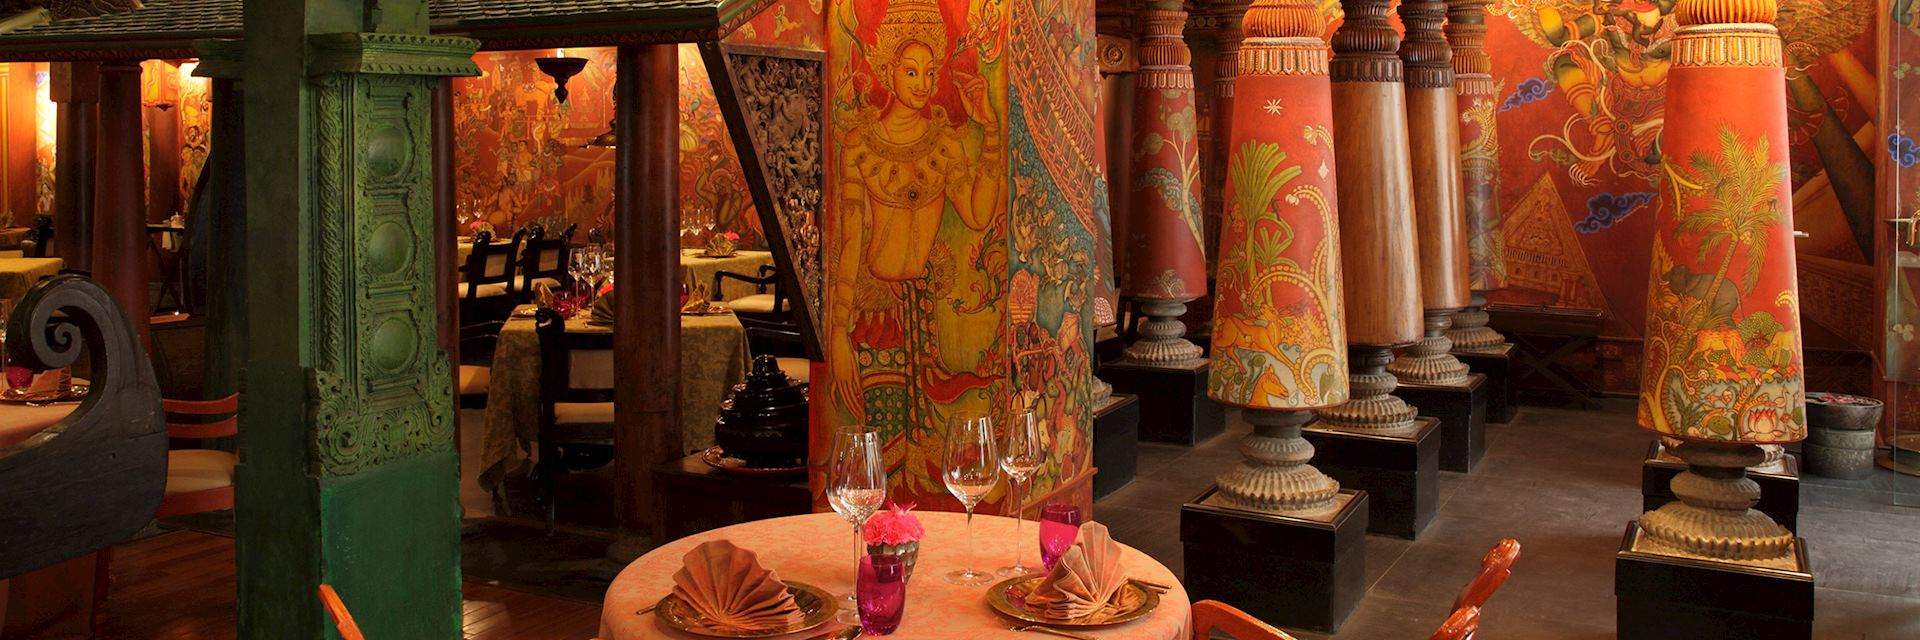 Imperial Hotel, Delhi